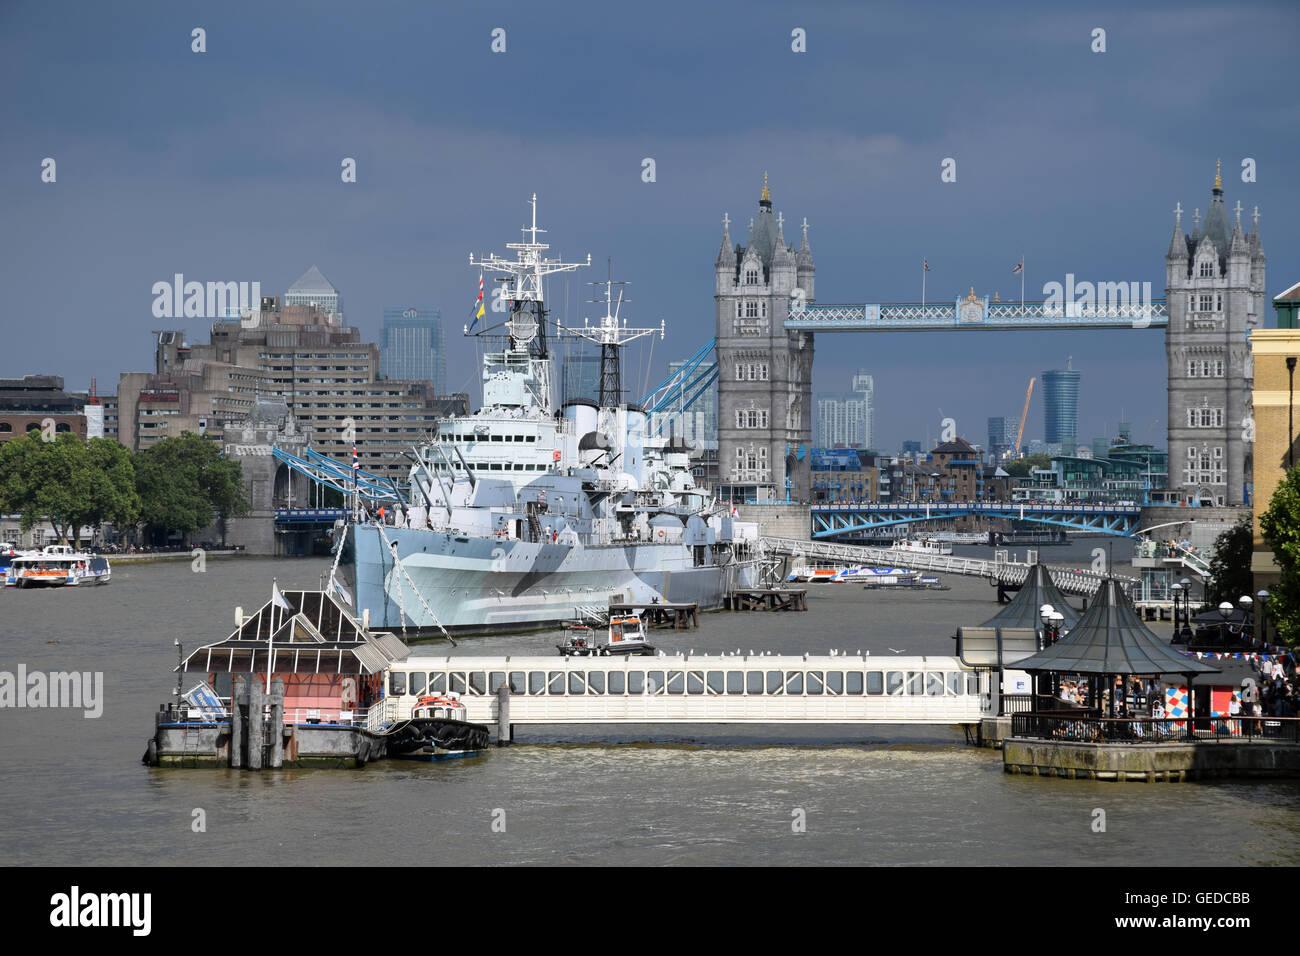 HMS Belfast & Tower Bridge, London UK July 2016 - Stock Image